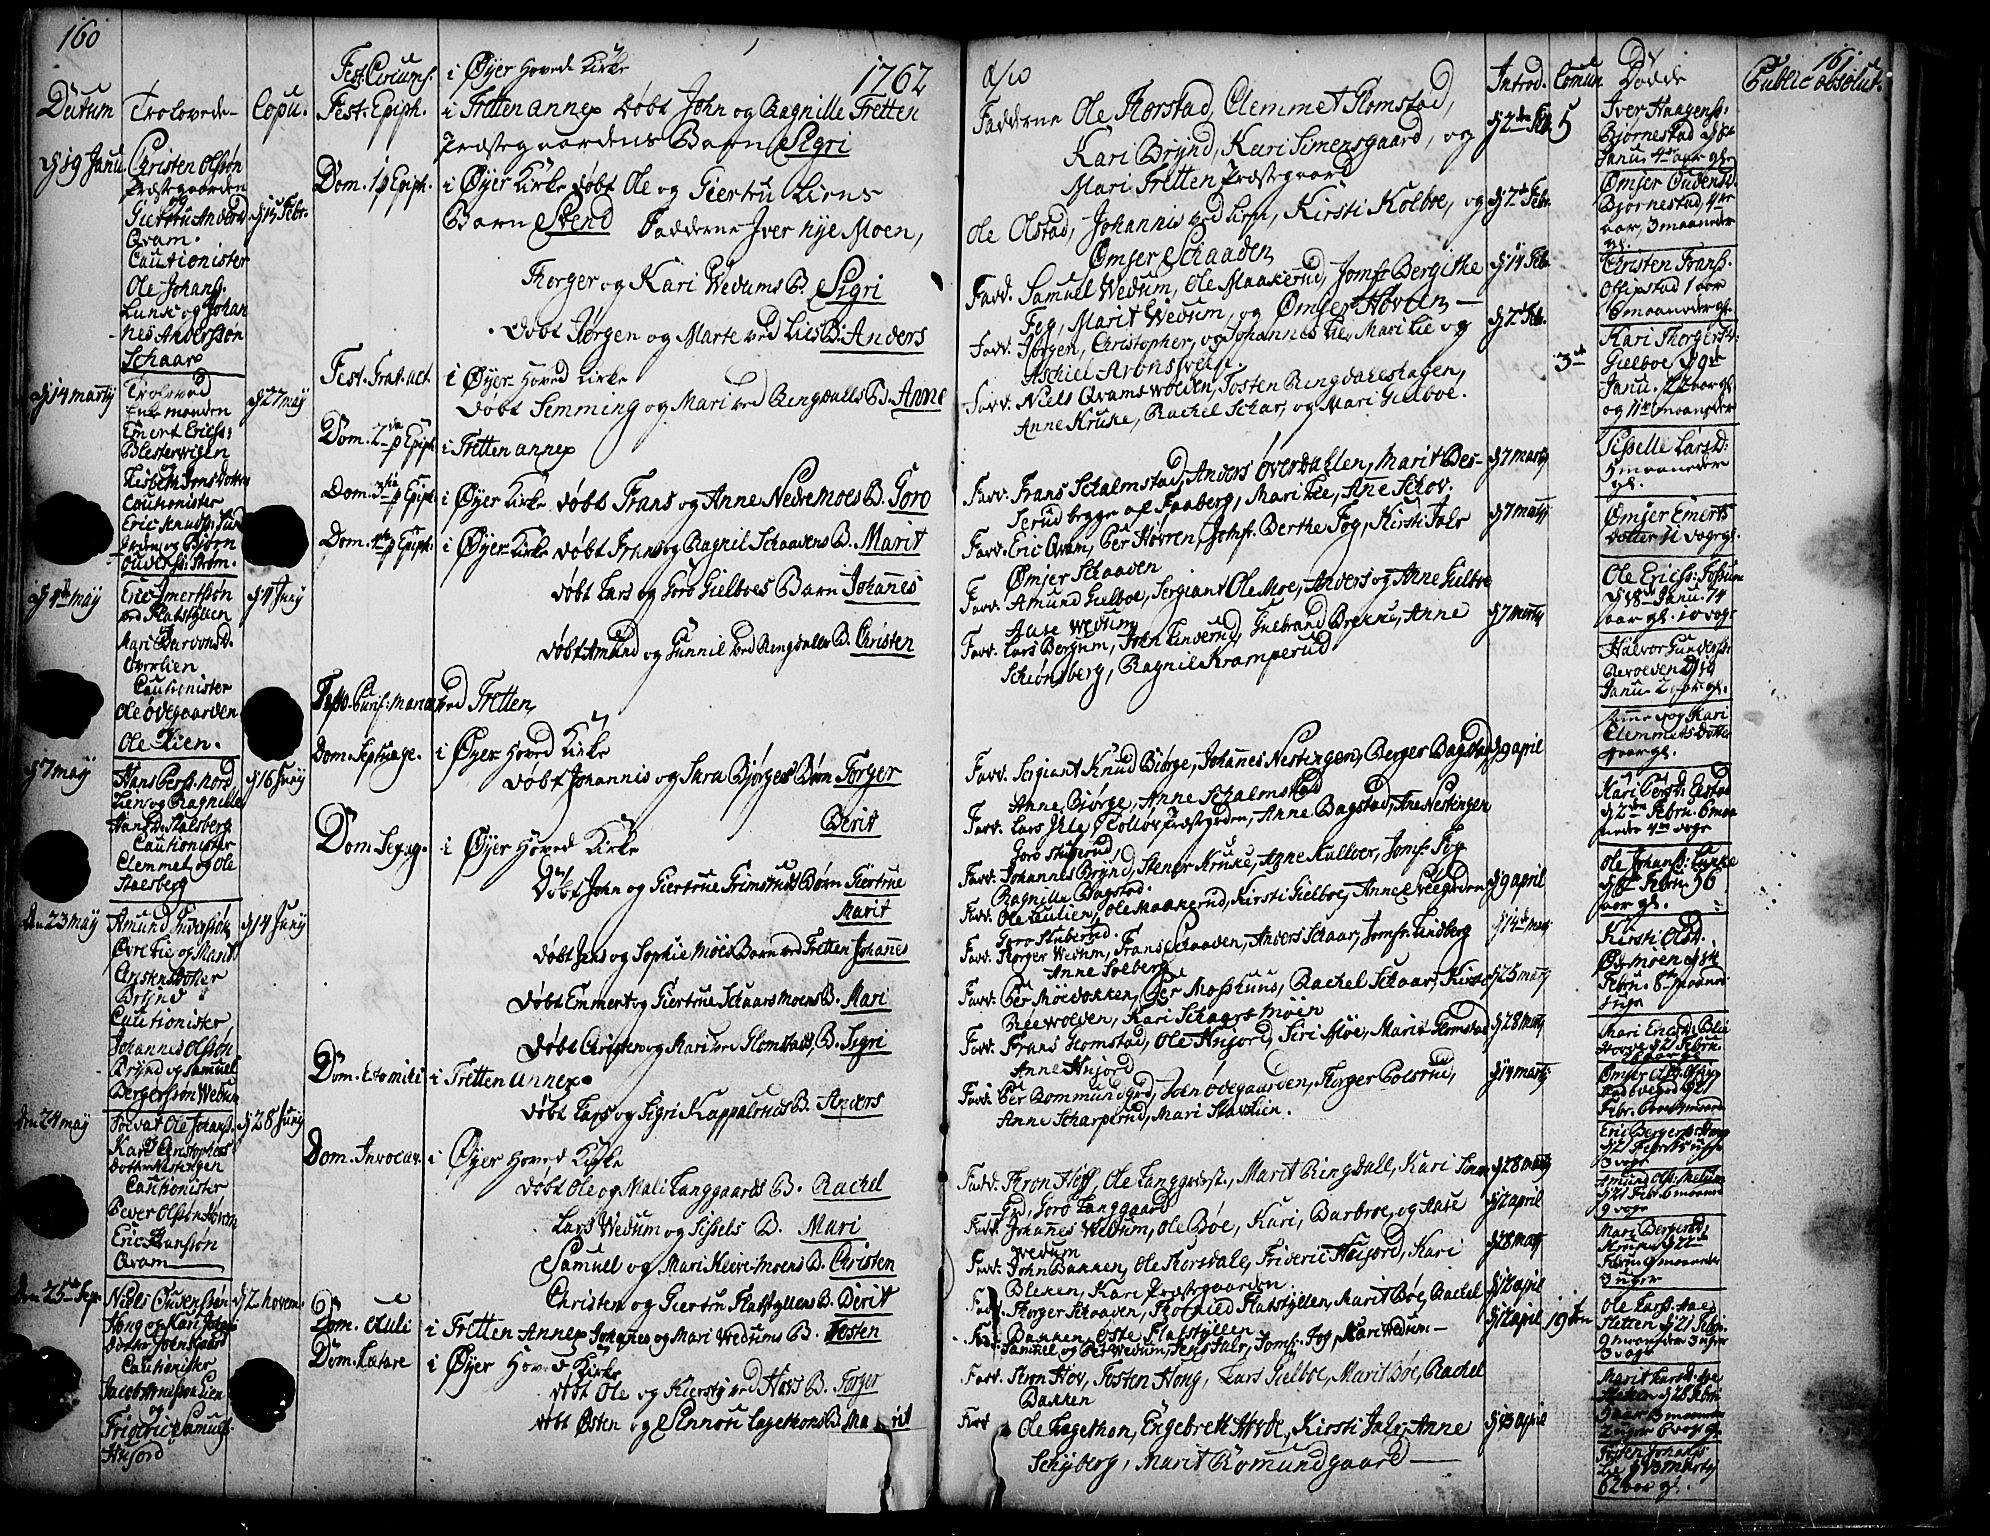 SAH, Øyer prestekontor, Ministerialbok nr. 2, 1733-1784, s. 160-161